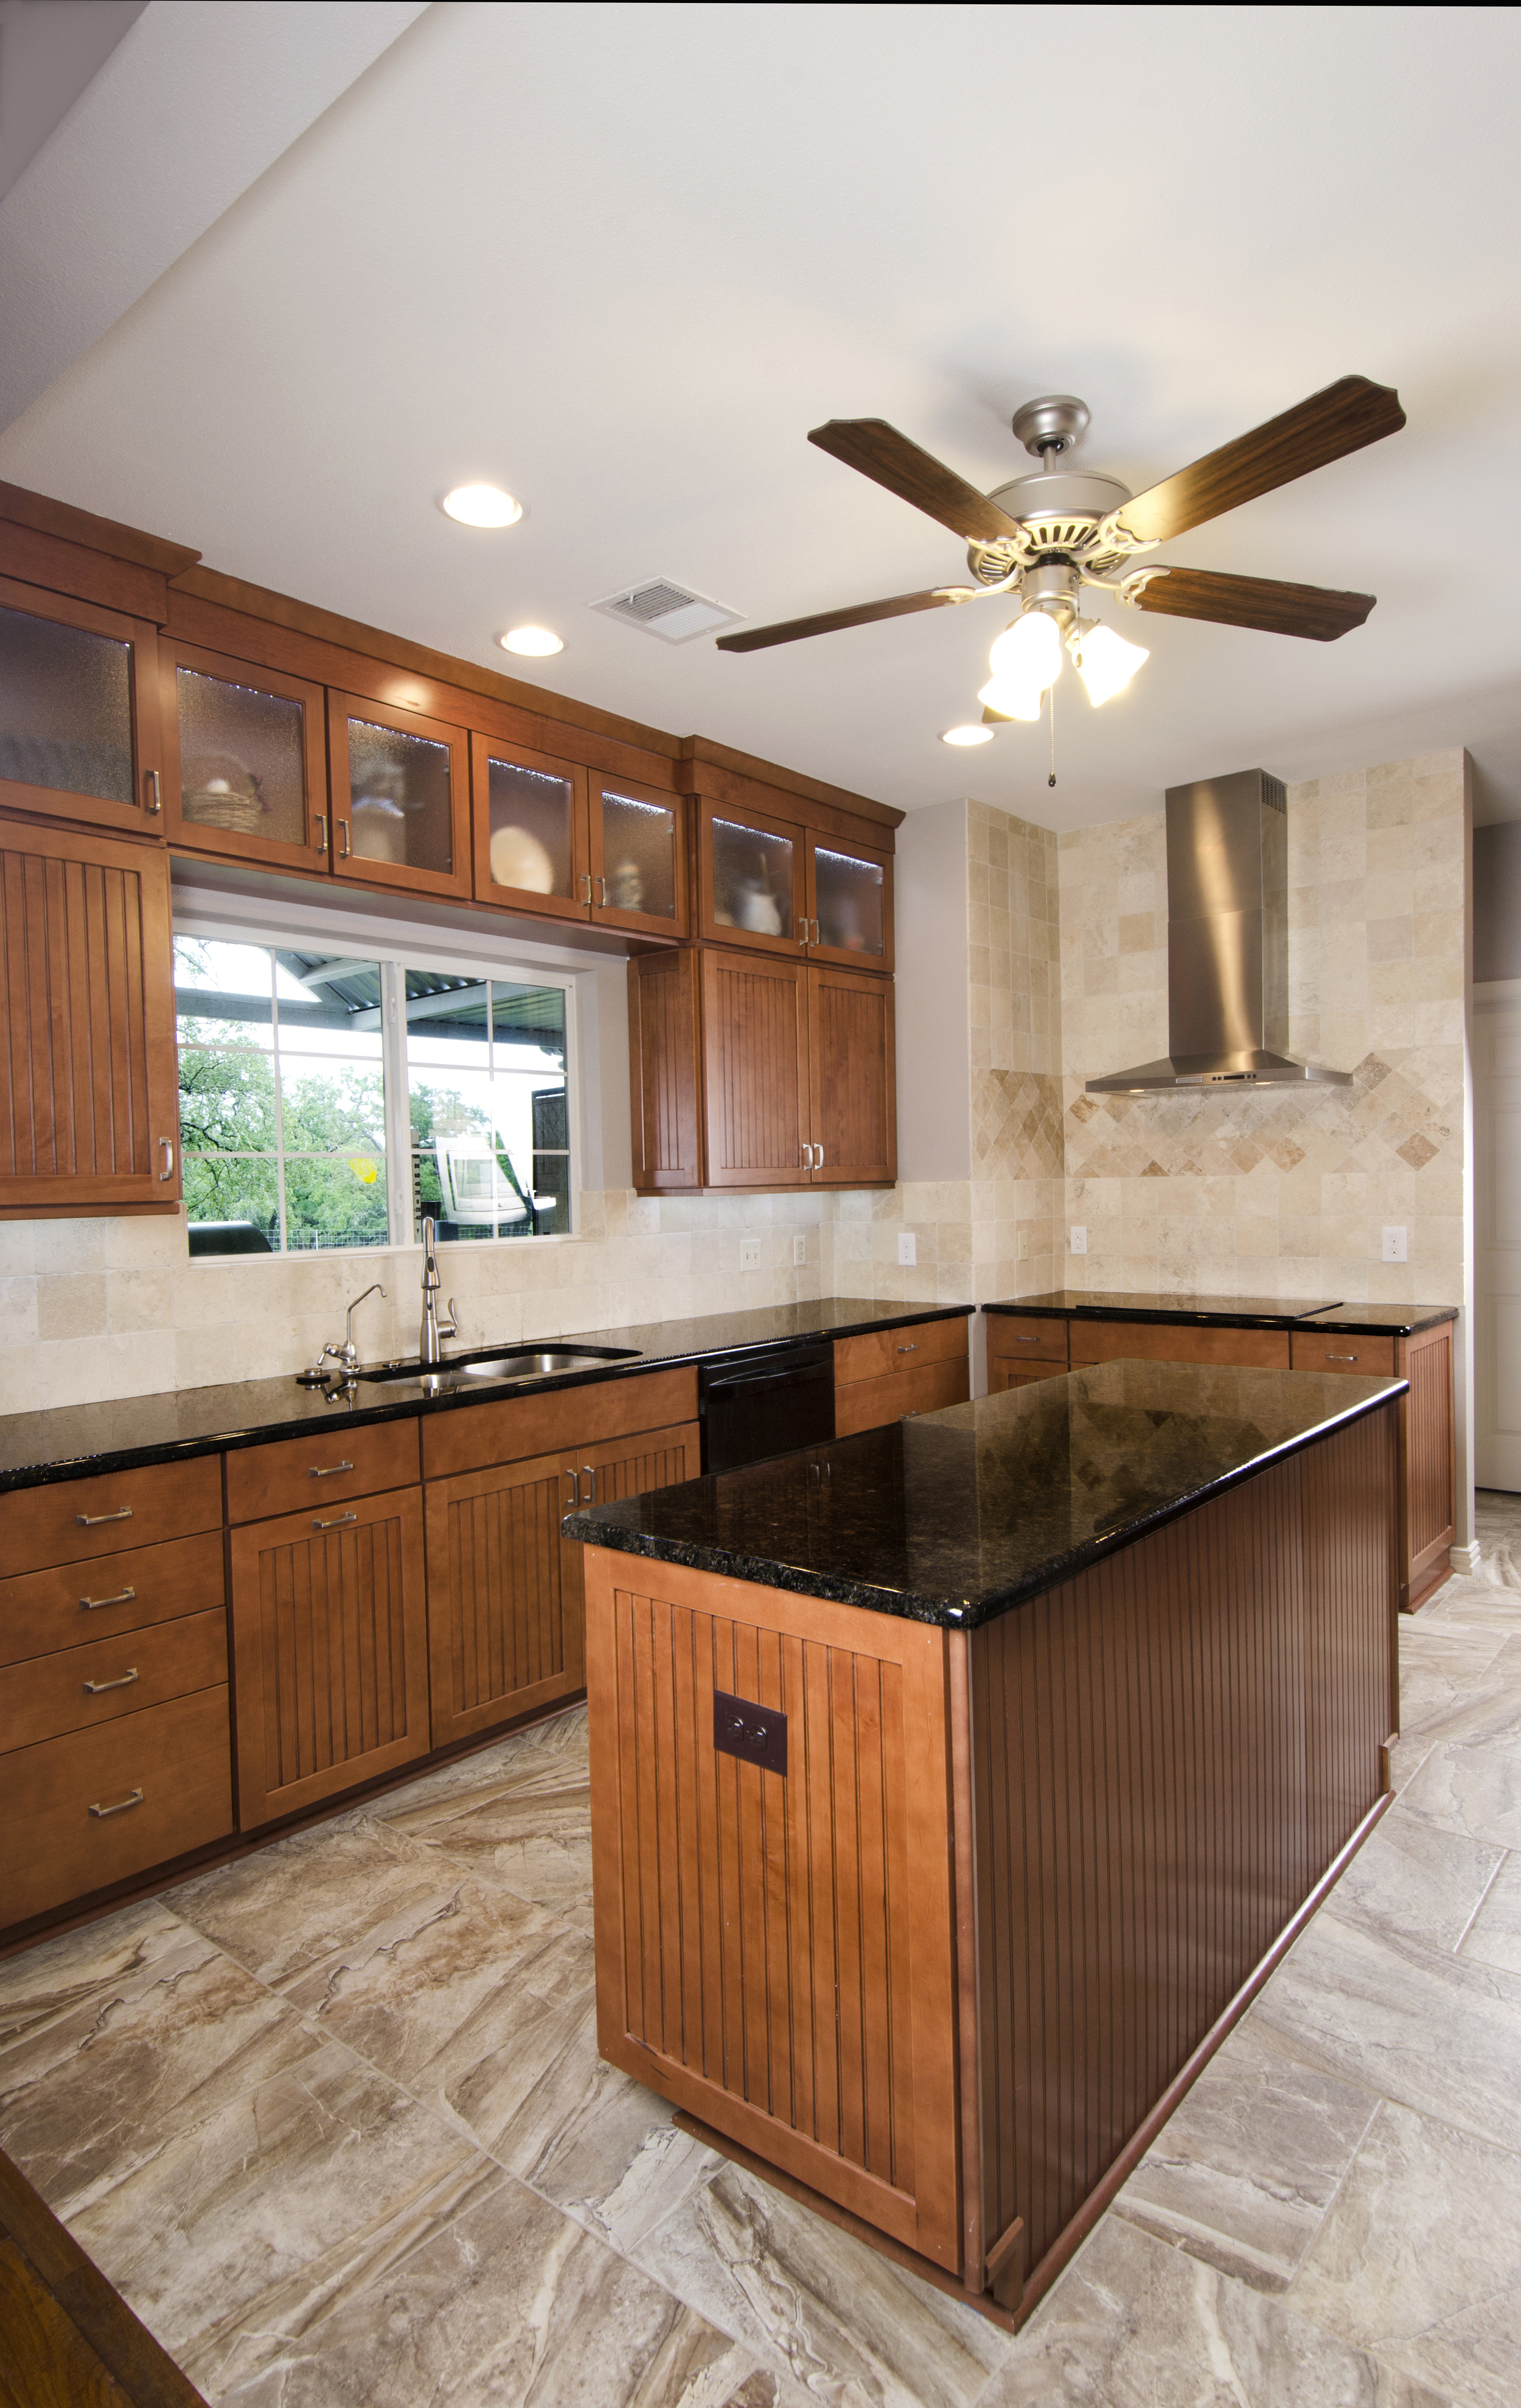 New-Braunfels_74_Rays-kitchen.jpg